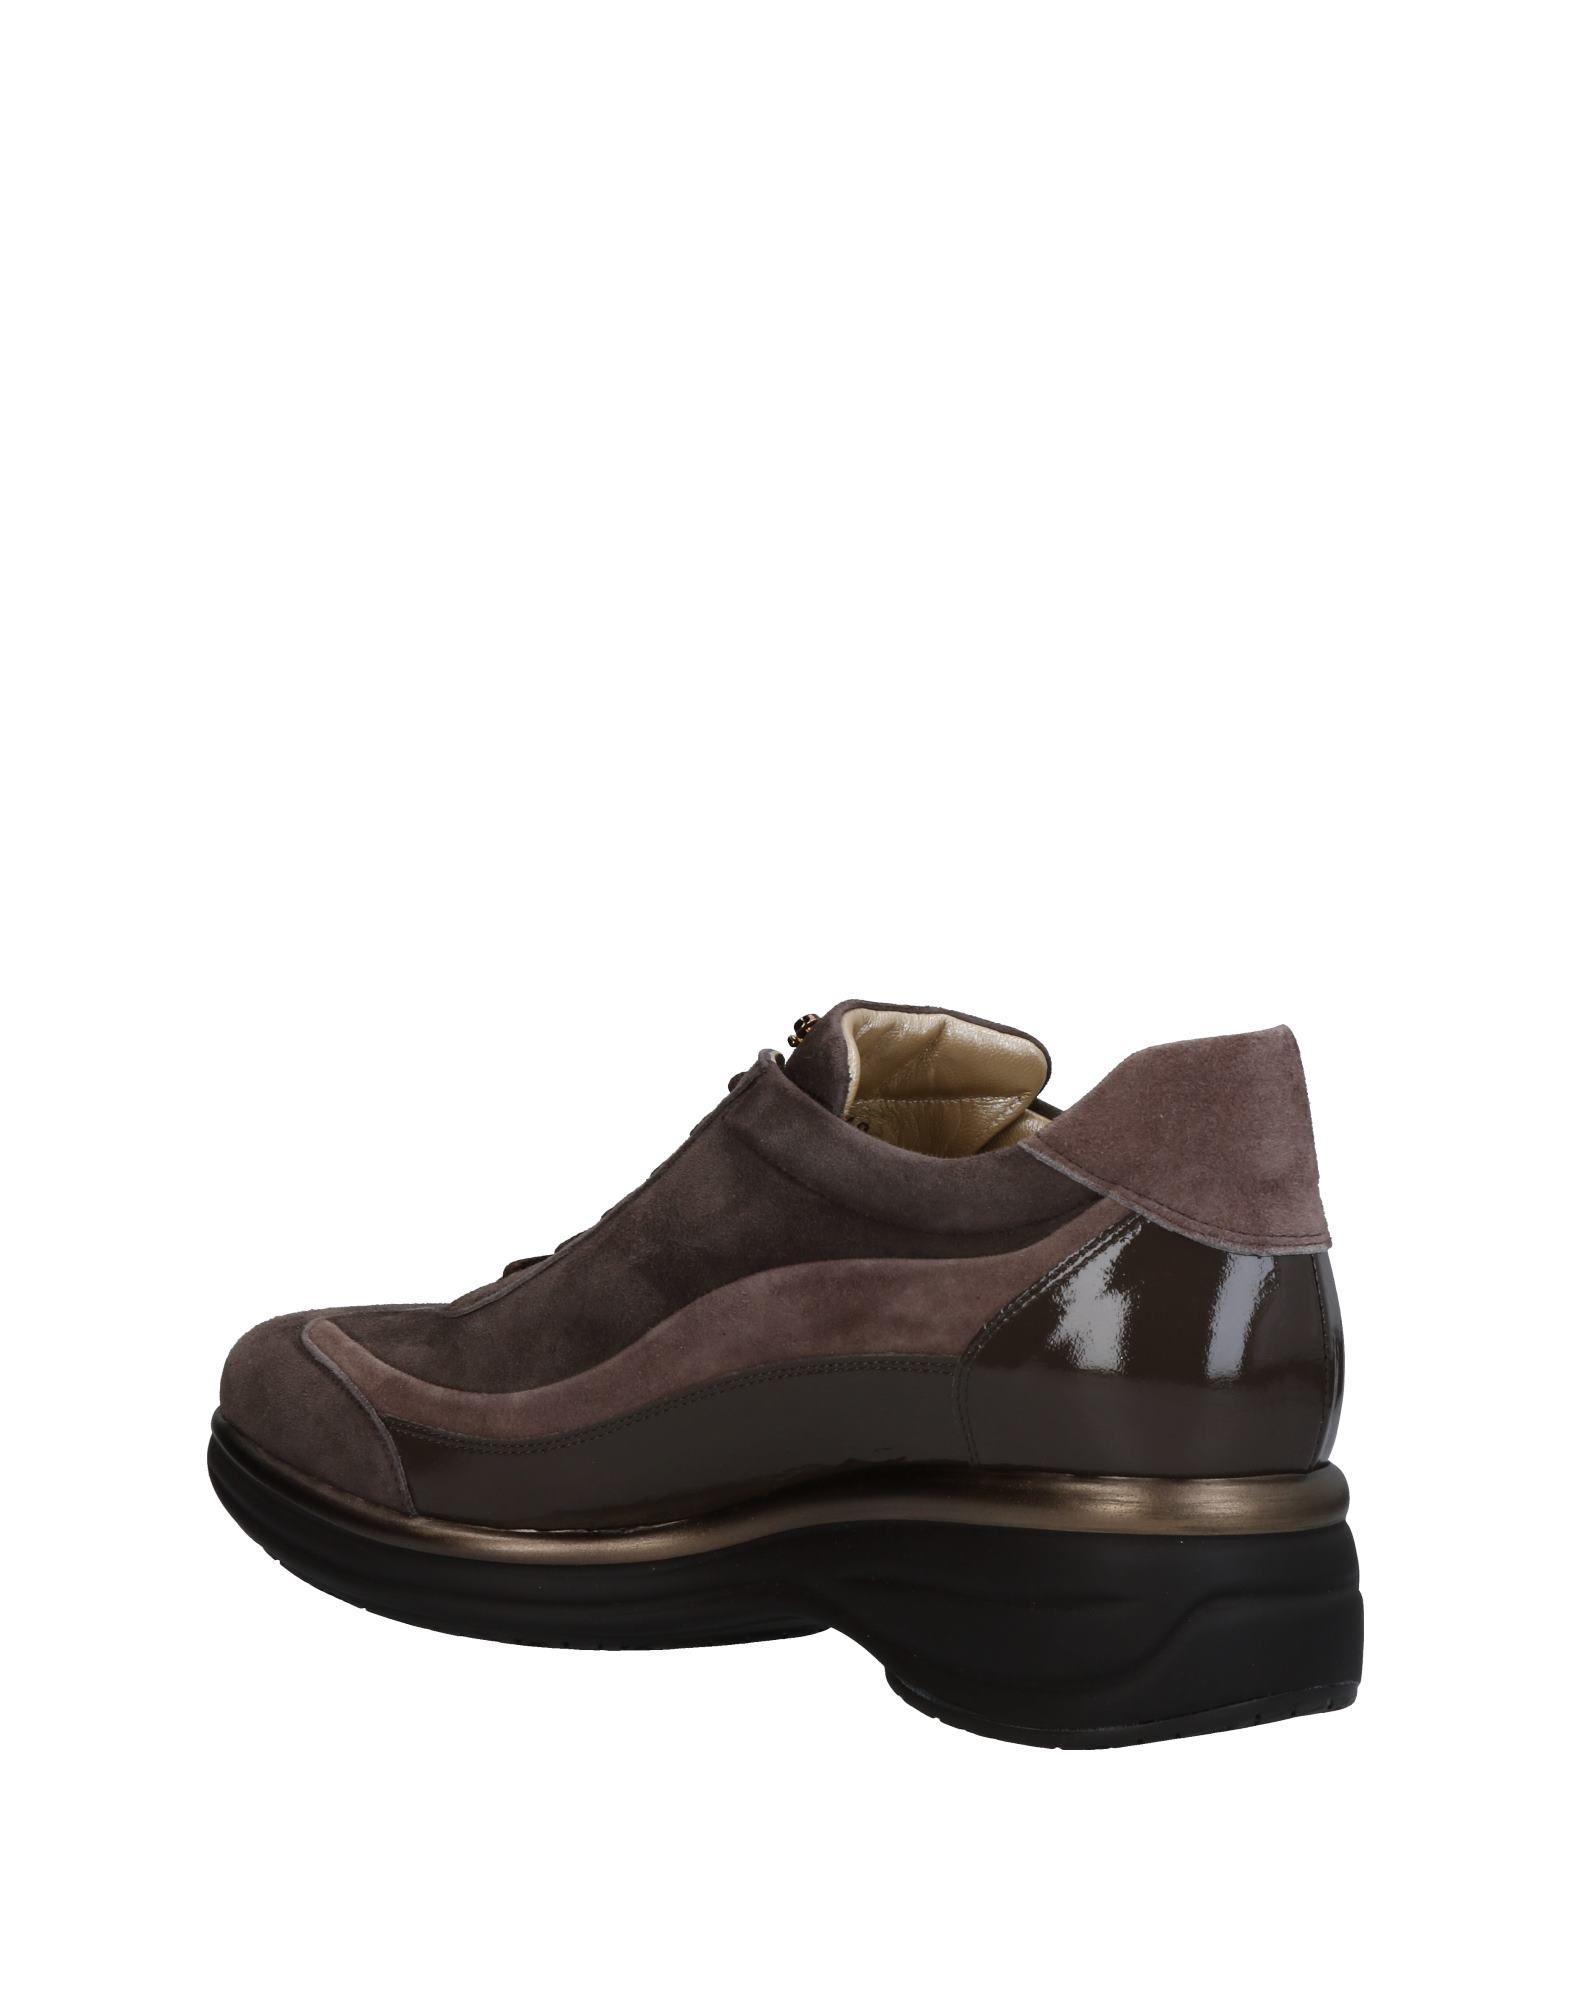 Cesare Paciotti Suede Low-tops & Sneakers in Dark Brown (Brown)